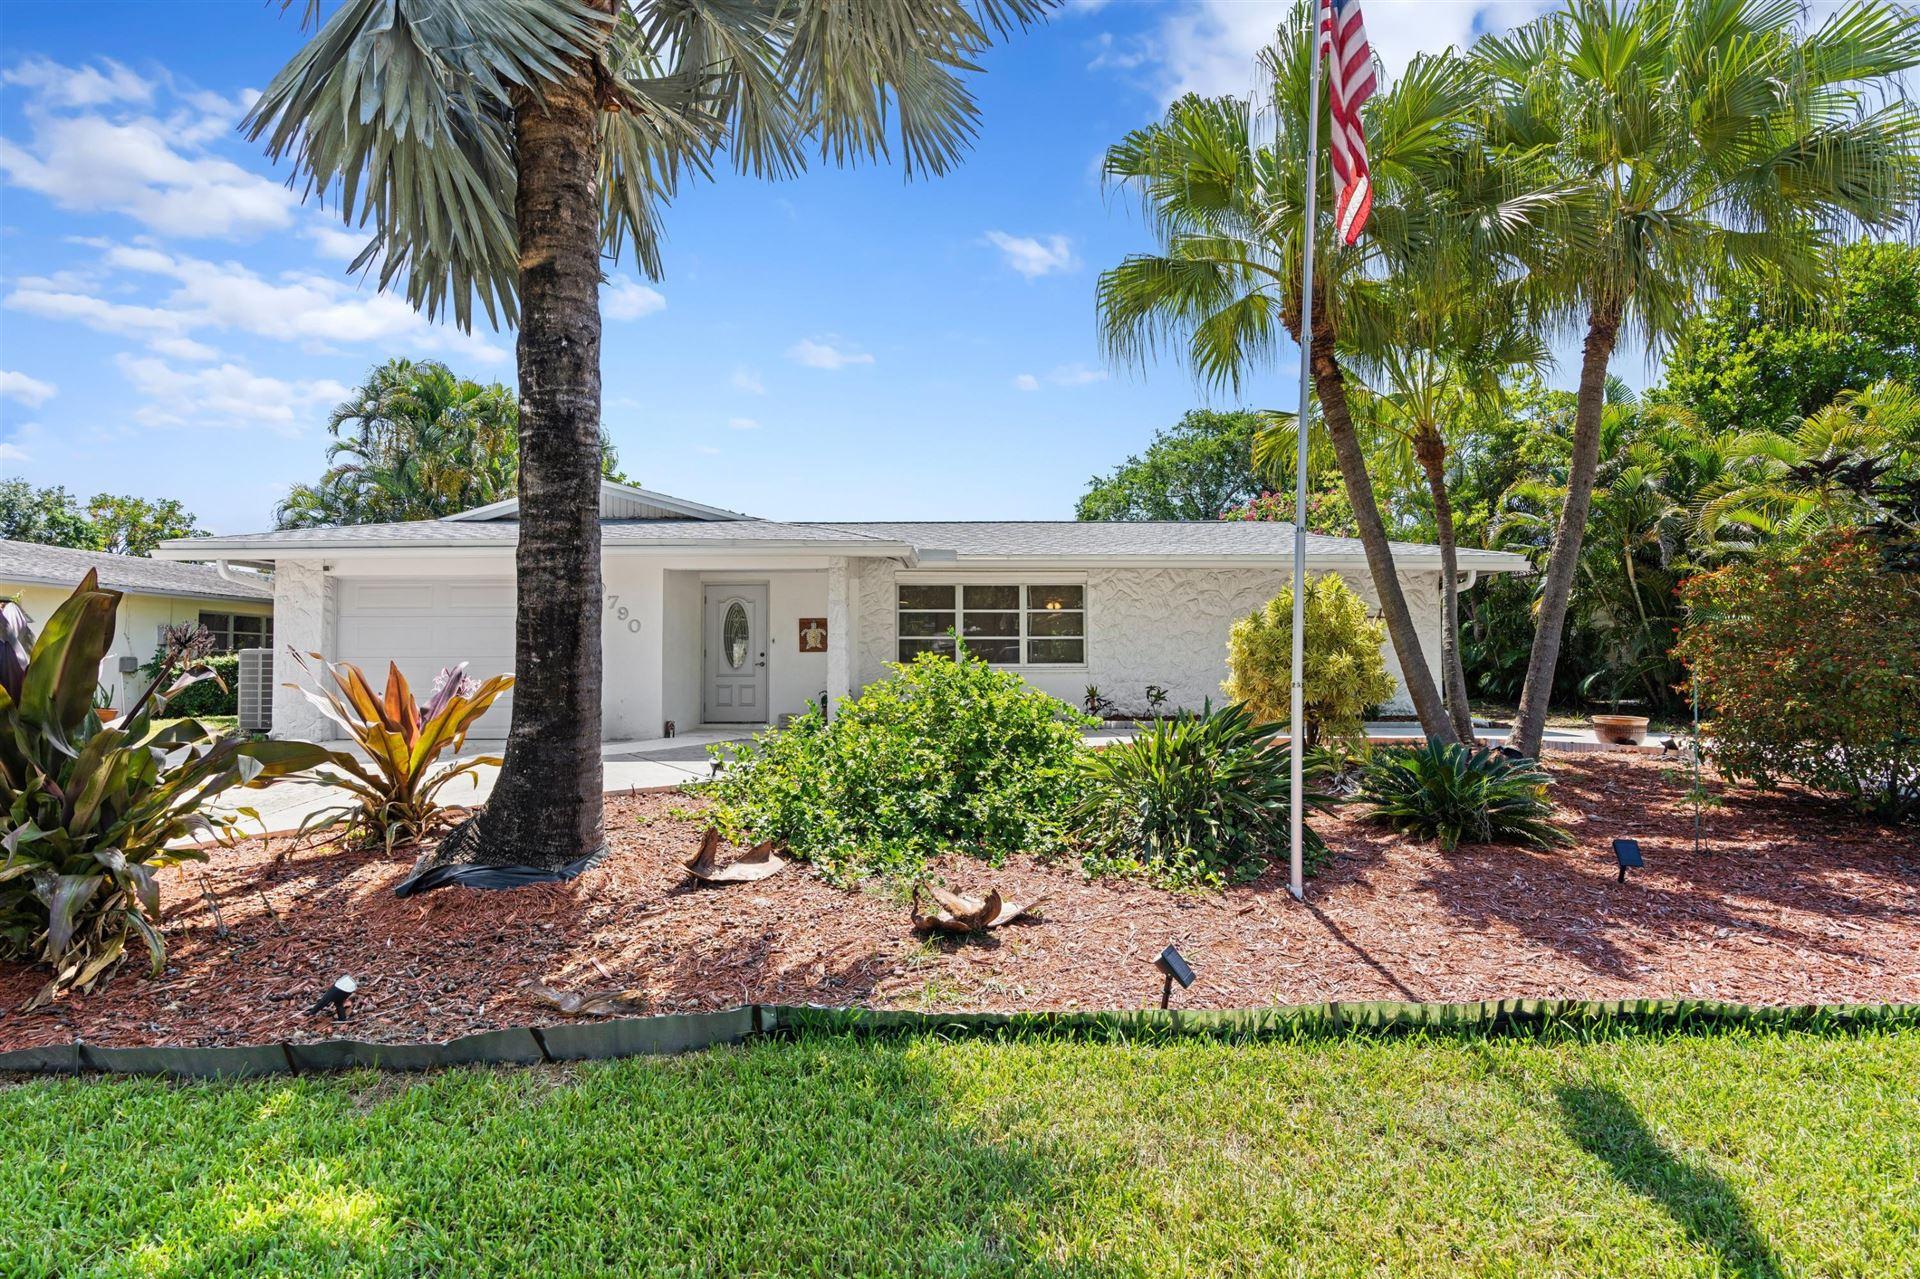 9790 Honeysuckle Avenue, Palm Beach Gardens, FL 33410 - MLS#: RX-10717686